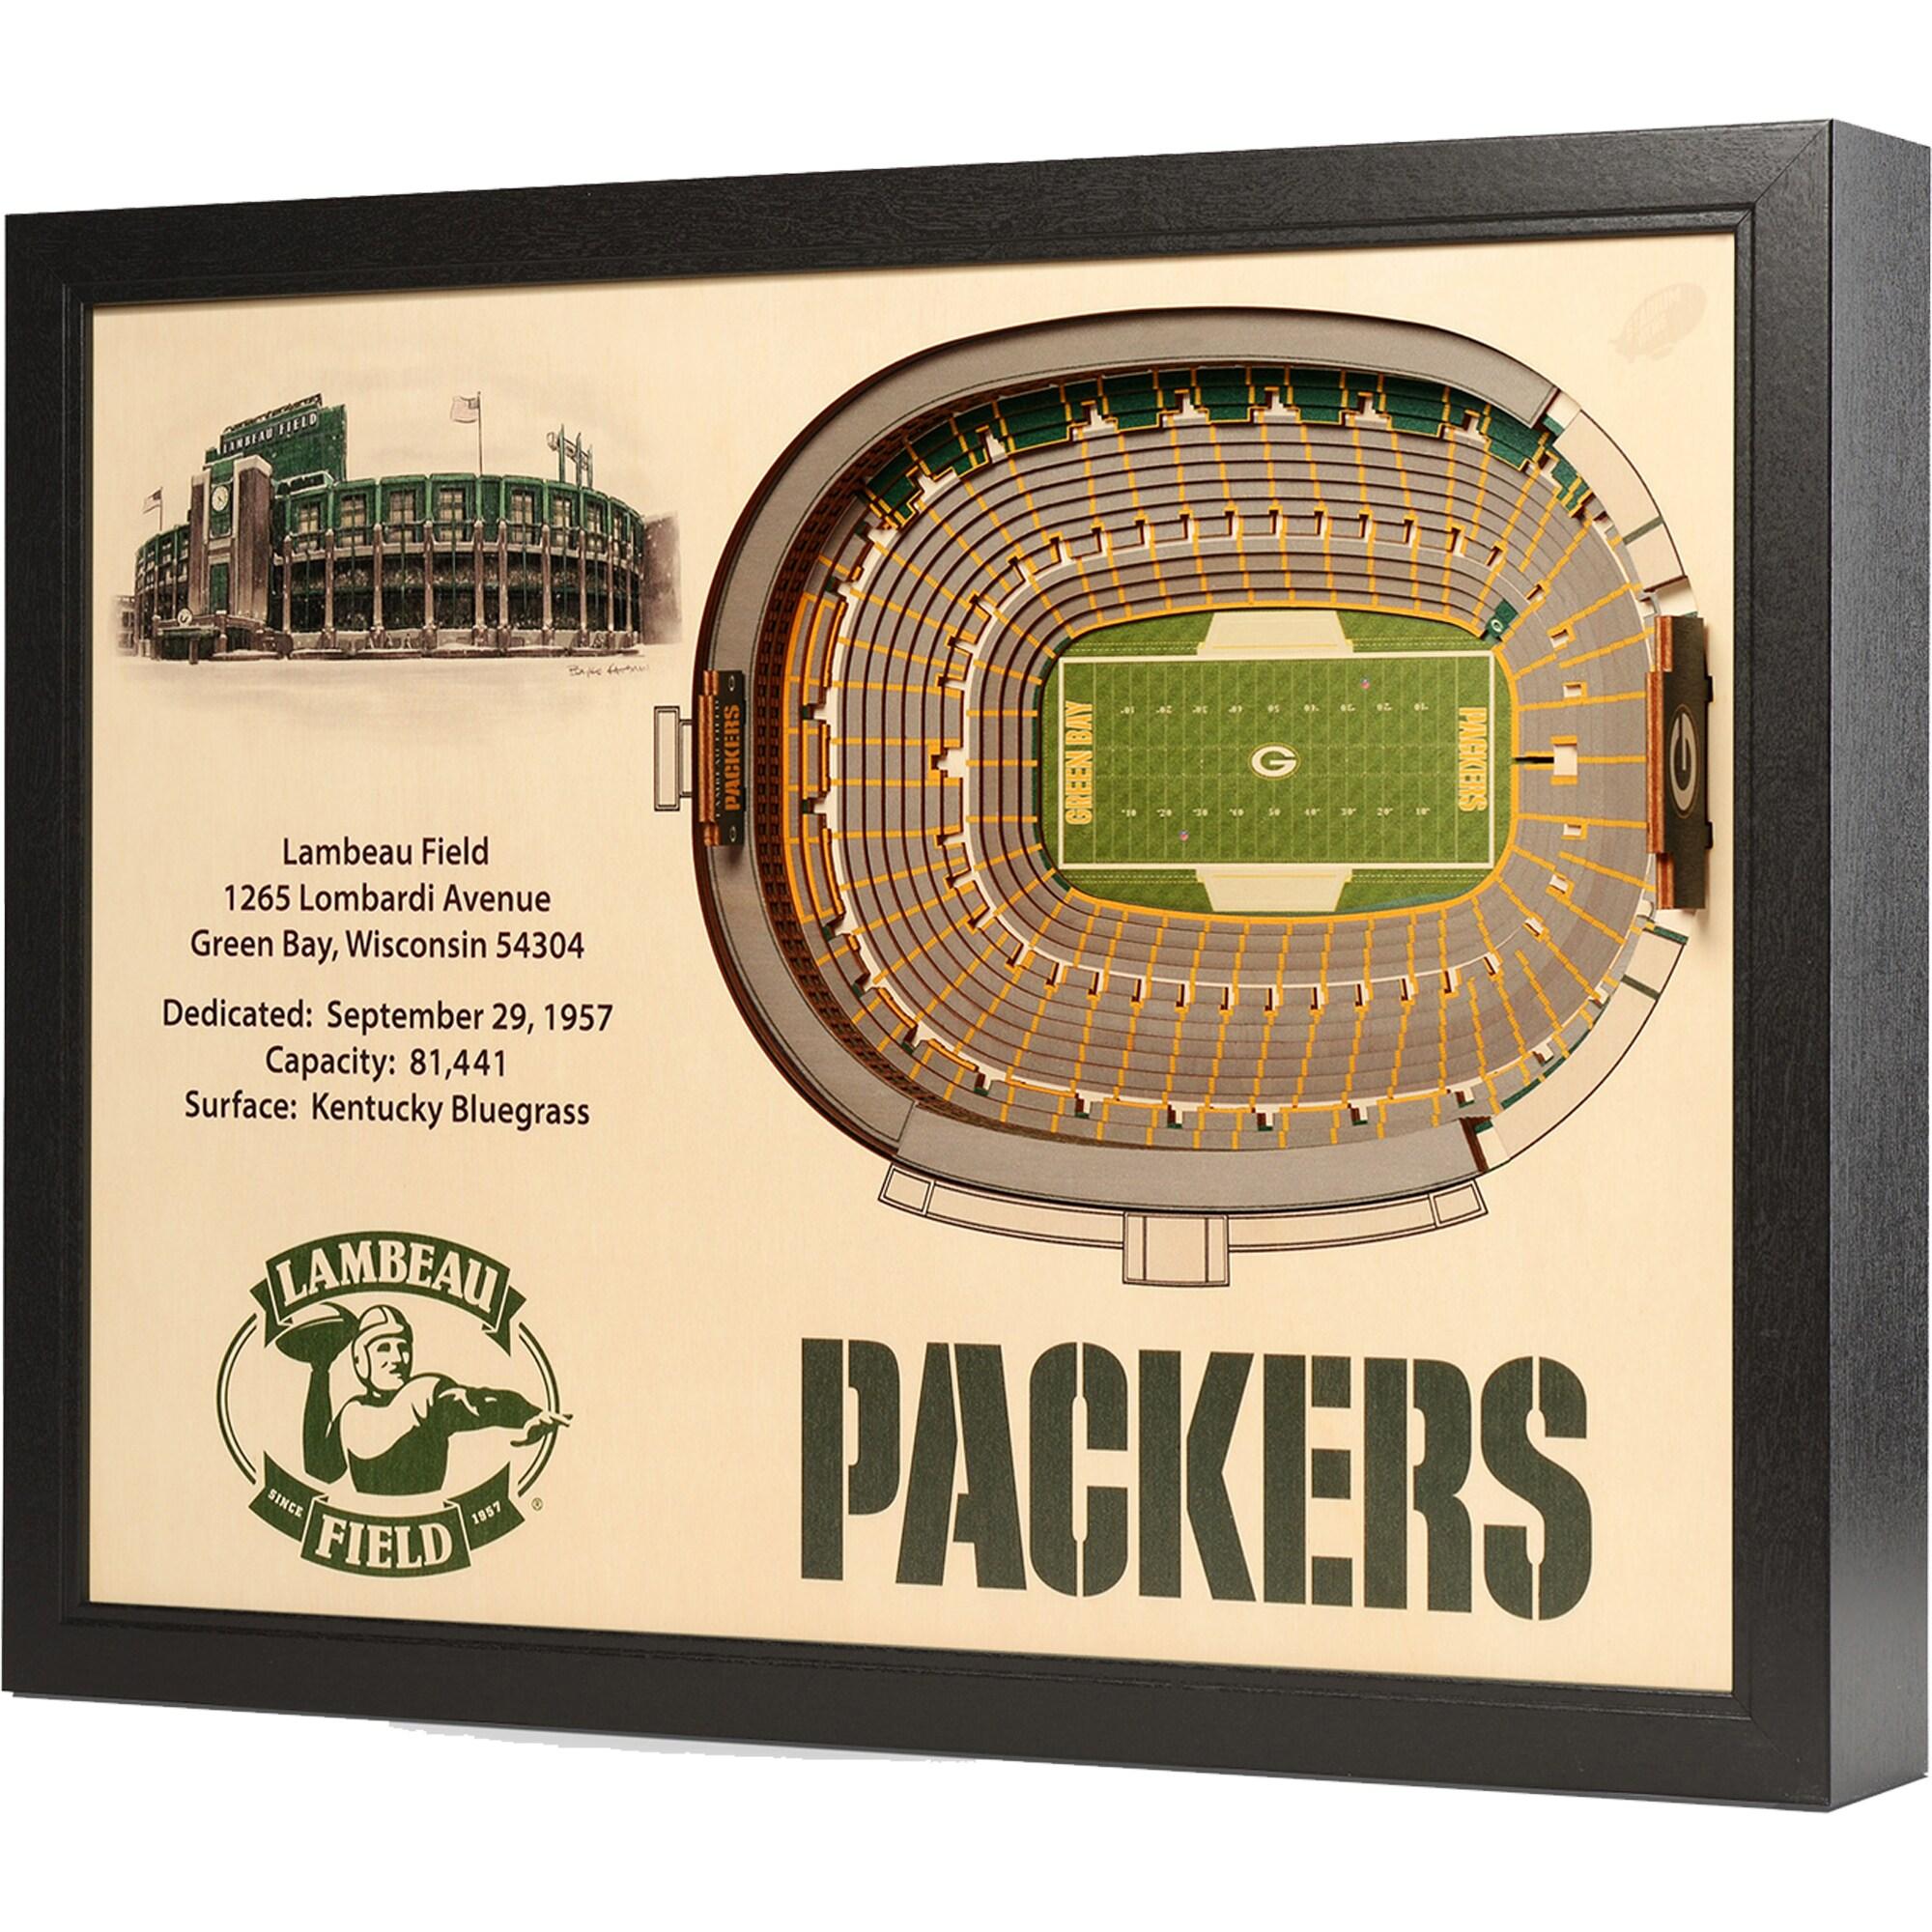 "Green Bay Packers Lambeau Field 25.5"" x 19.5"" Stadium Views Wall Art"